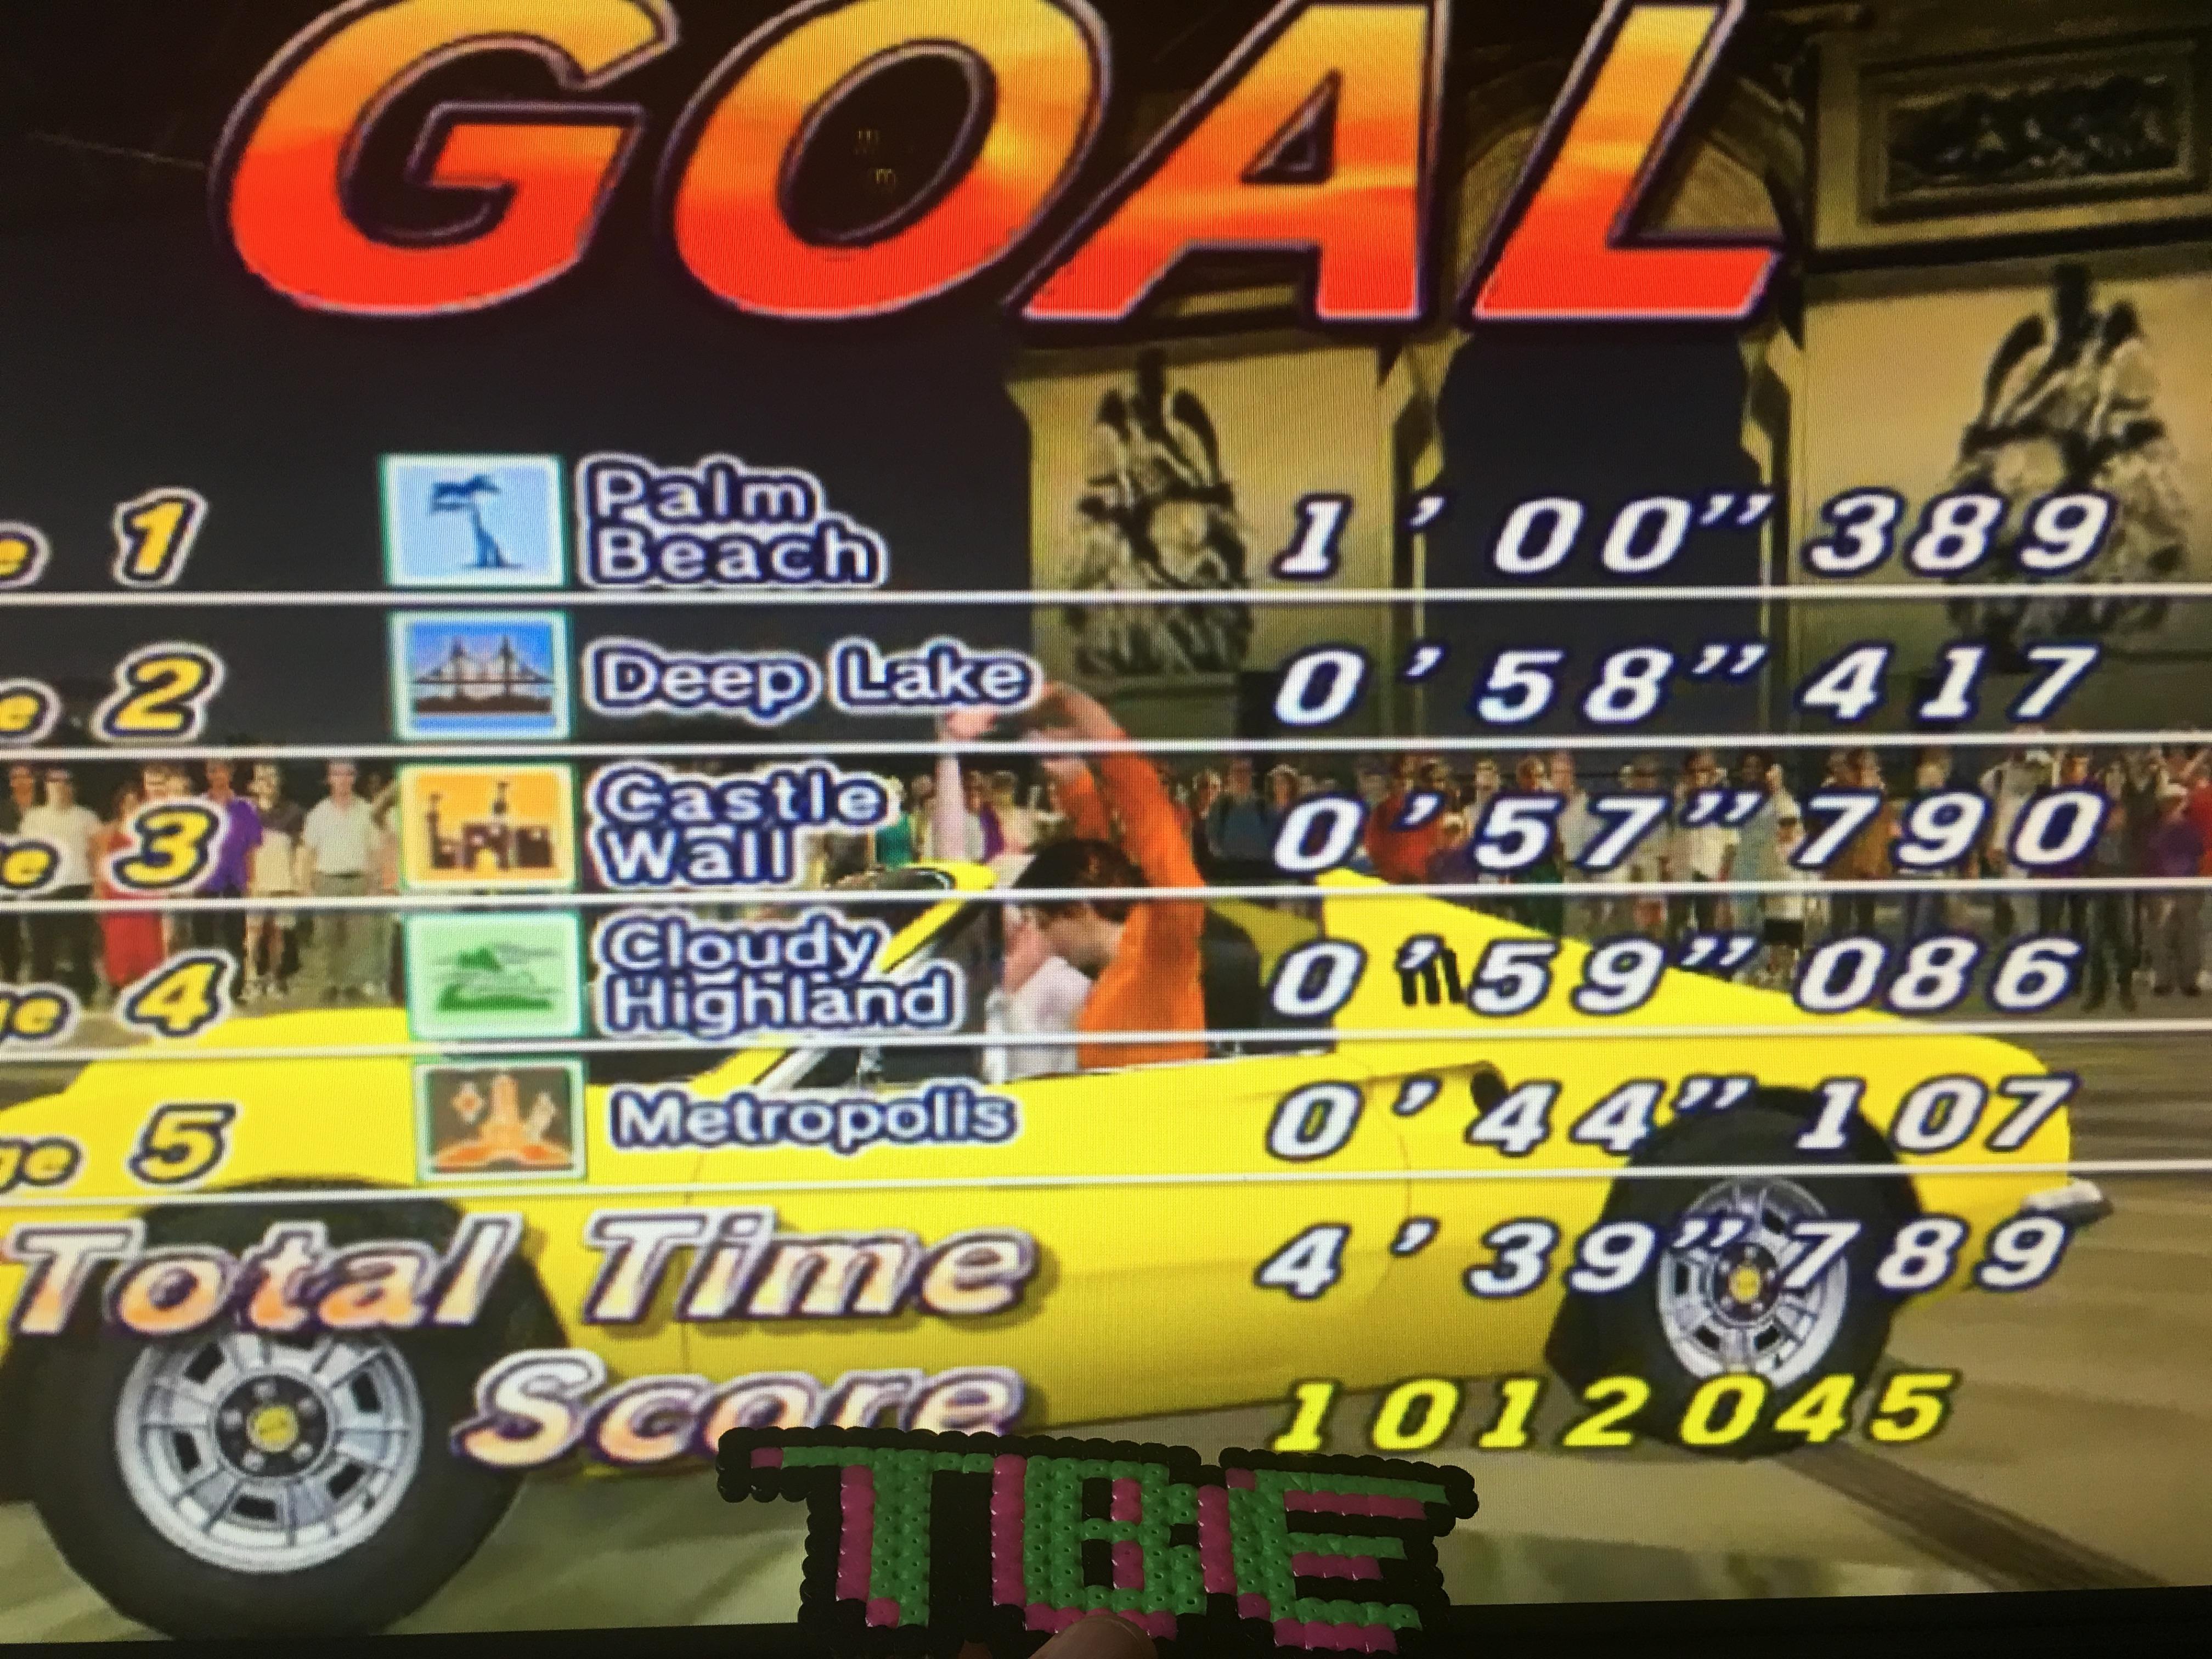 Outrun 2006: Coast to Coast: Outrun 2: Goal B (PC) high score